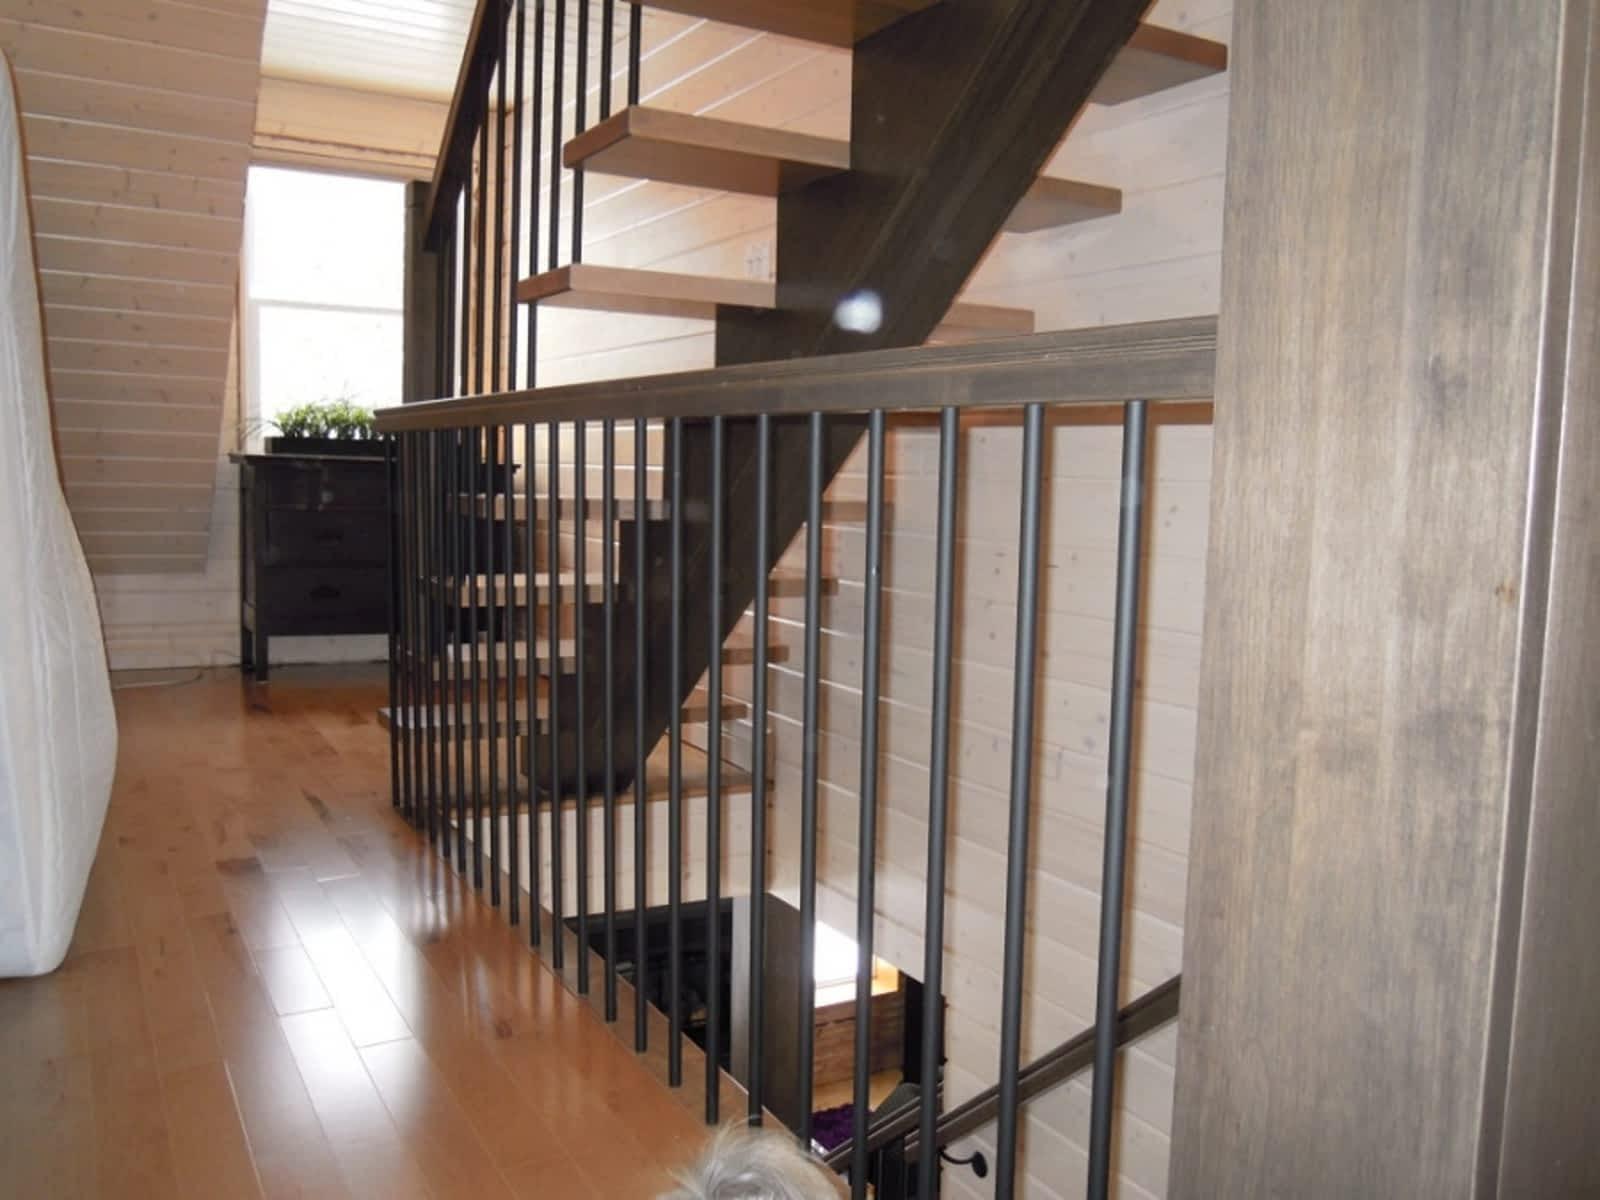 Les escaliers mario girard opening hours 743 ch de la baie rr 1 rigaud qc